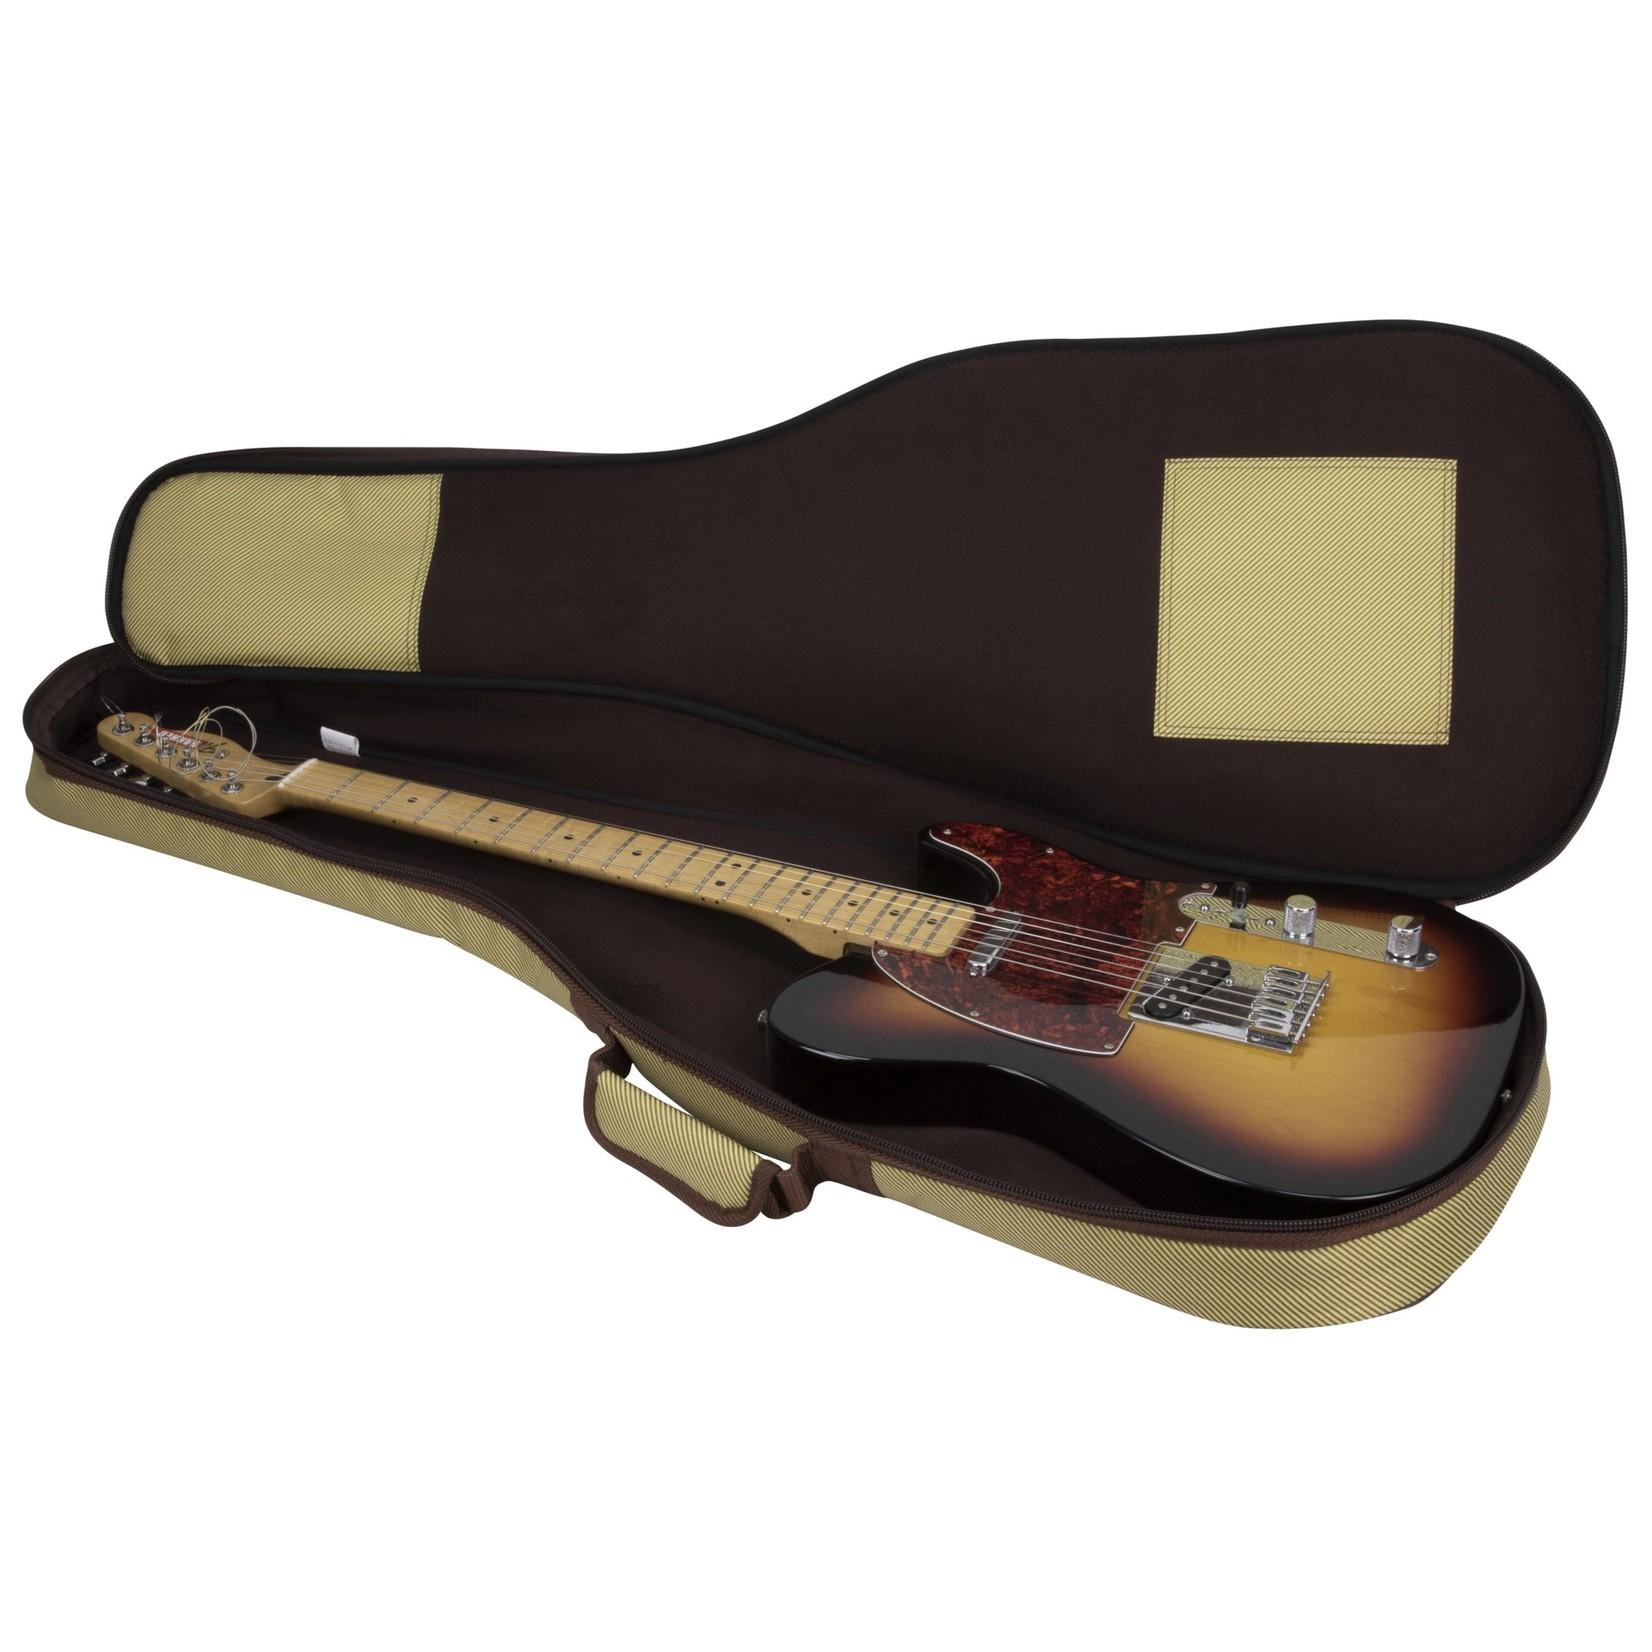 Kaces Kaces Gigpak Electric Guitar Gig Bag - Tweed (vintage vibe!)